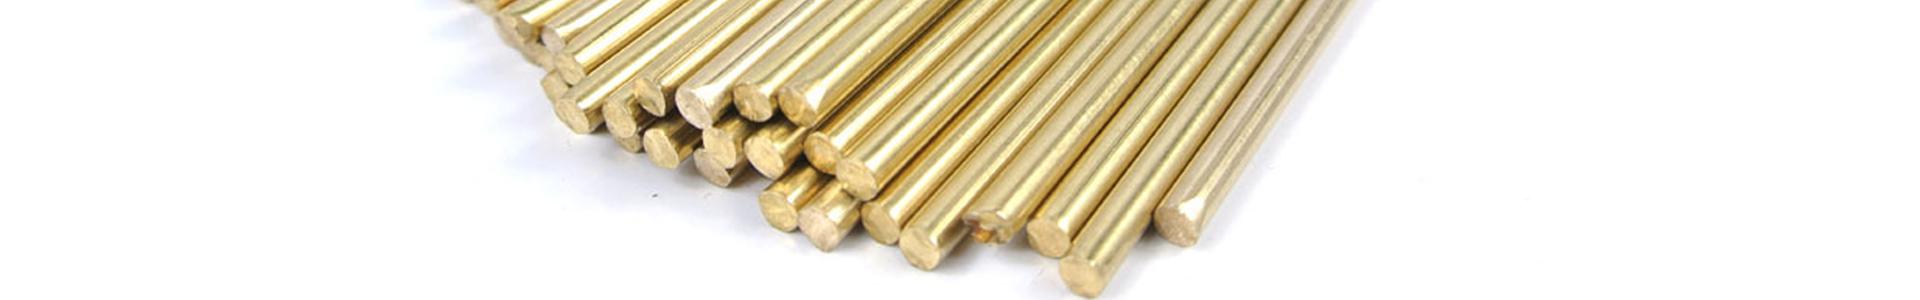 4 ottone bronzo